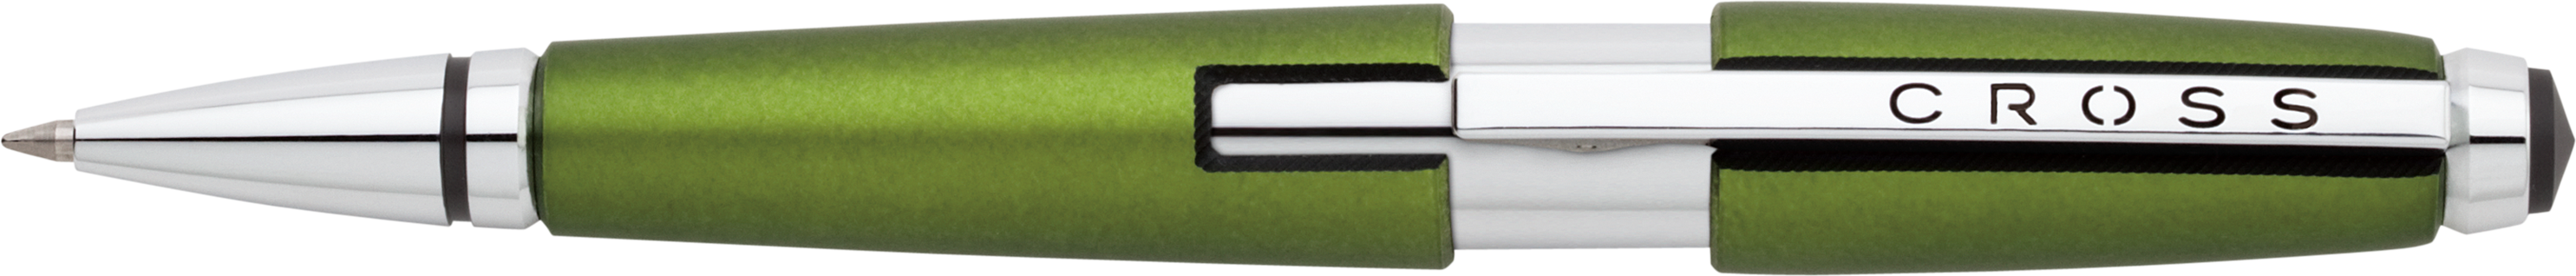 Edge Octane Green Gel Rollerball Pen